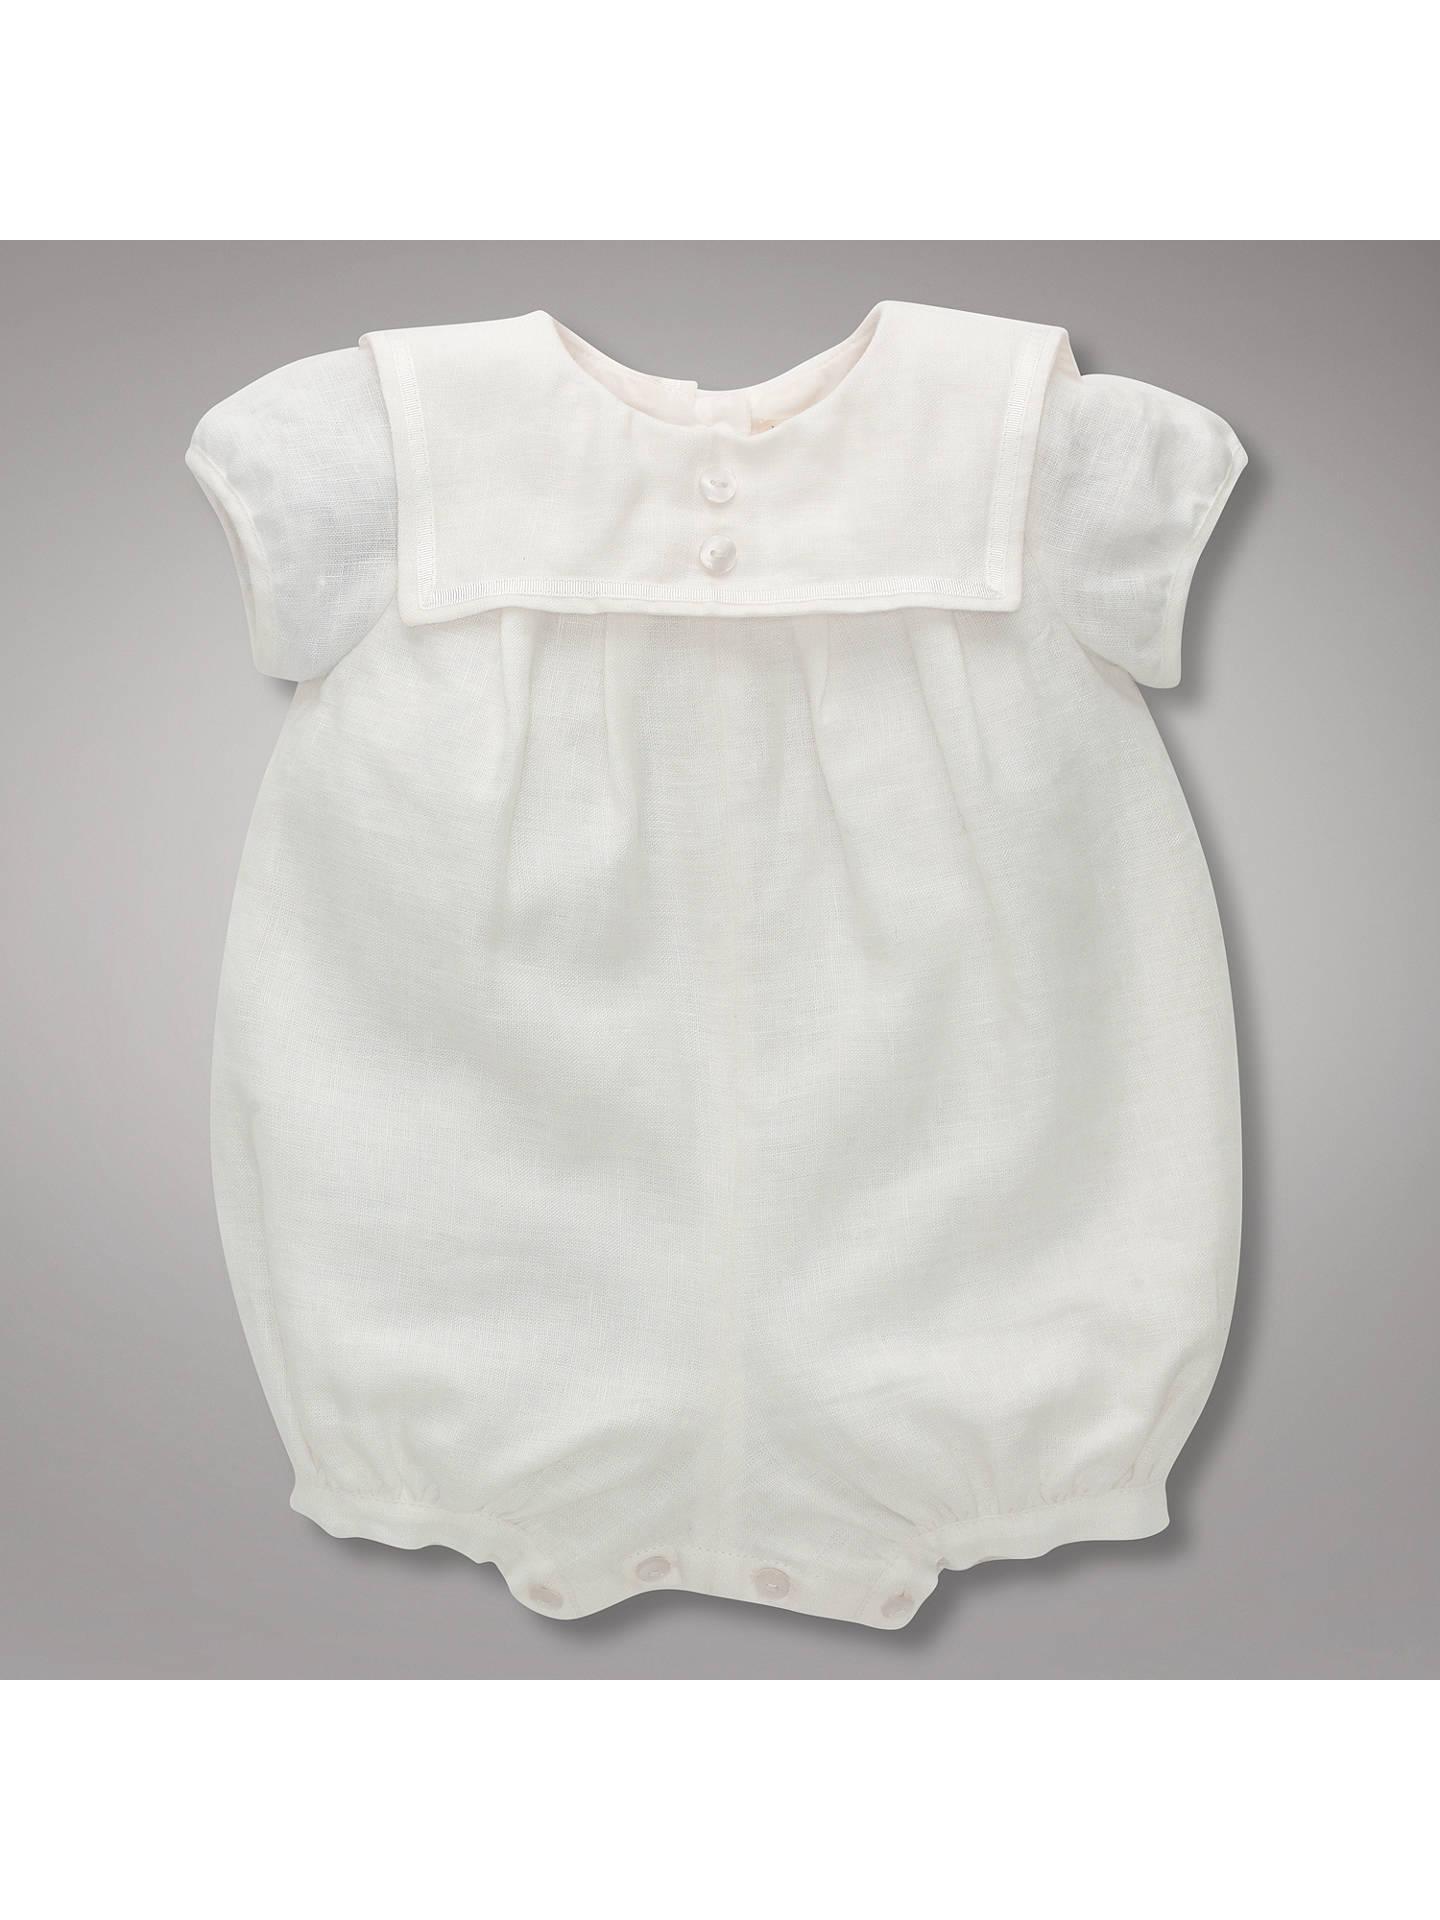 PLAIN CREAM COTTON BABY BOYS ROMPER CHRISTENING BAPTISM CLOTHES PLAIN SOFT